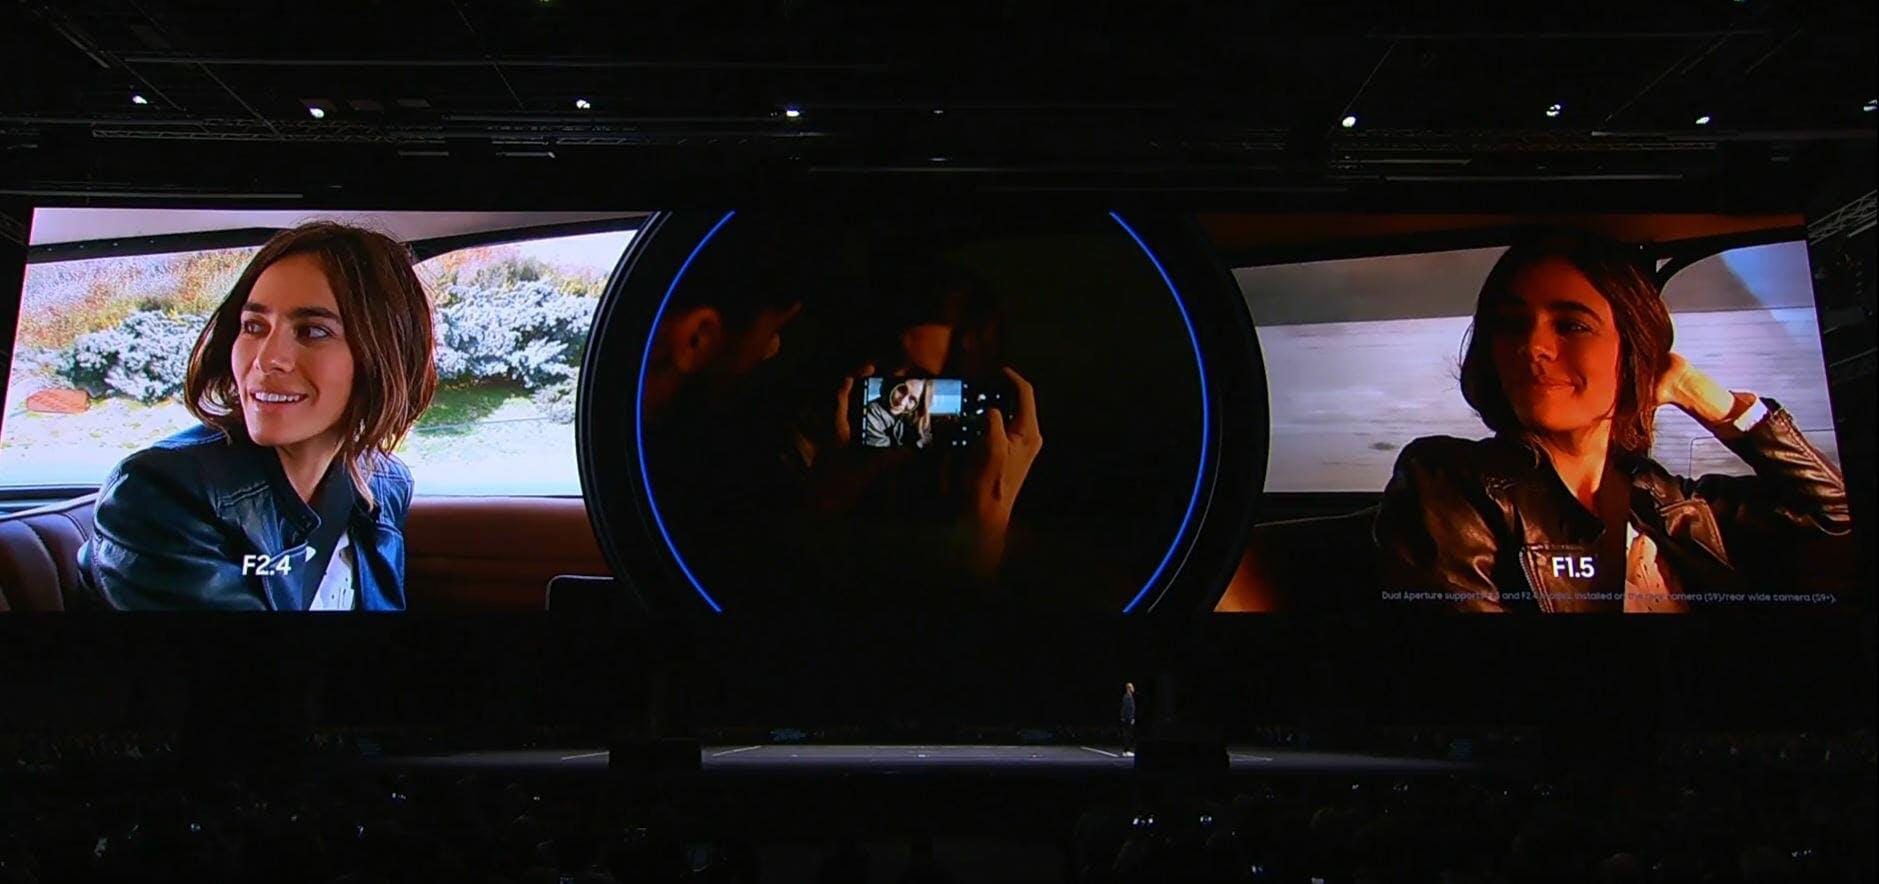 samsung galaxy s9+ dual aperture camera